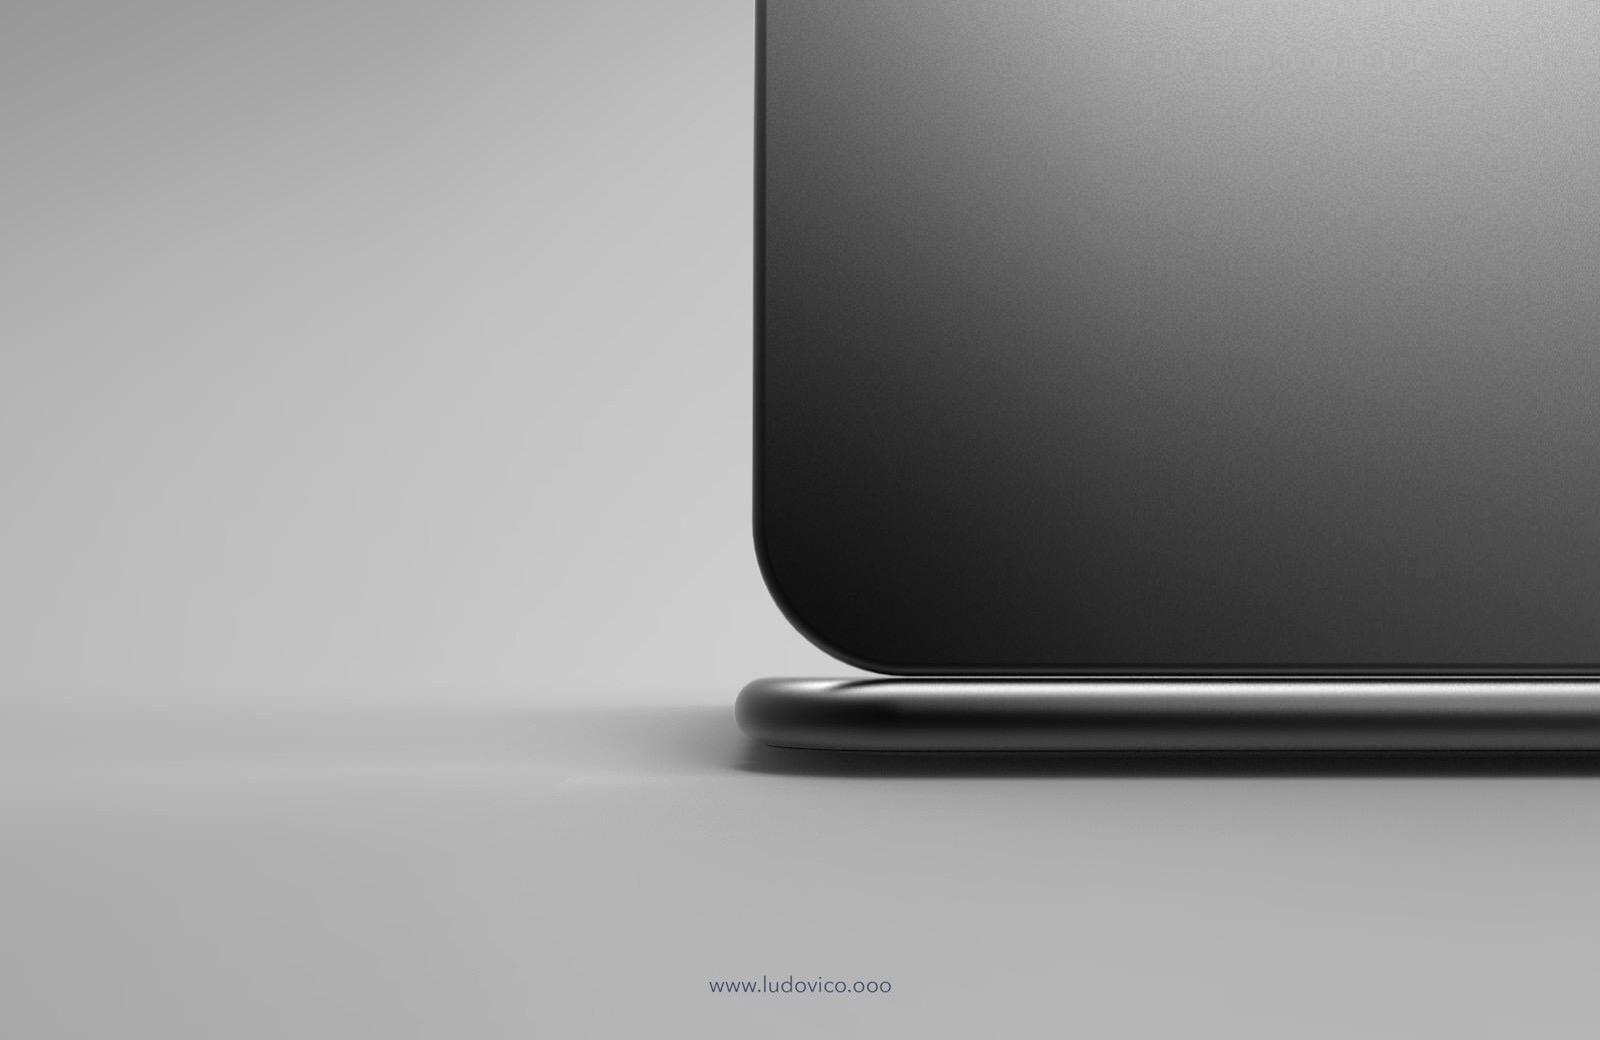 MacBook X Concept Image 5